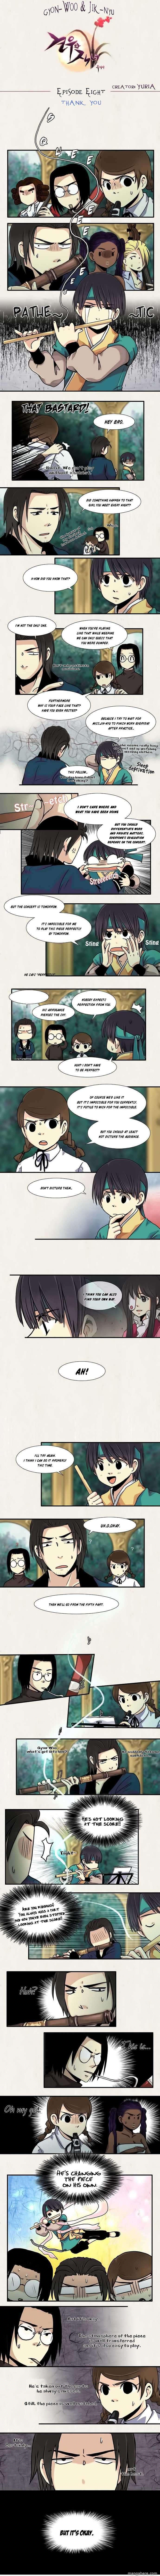 Gyon Woo Jik Nyu 8 Page 2